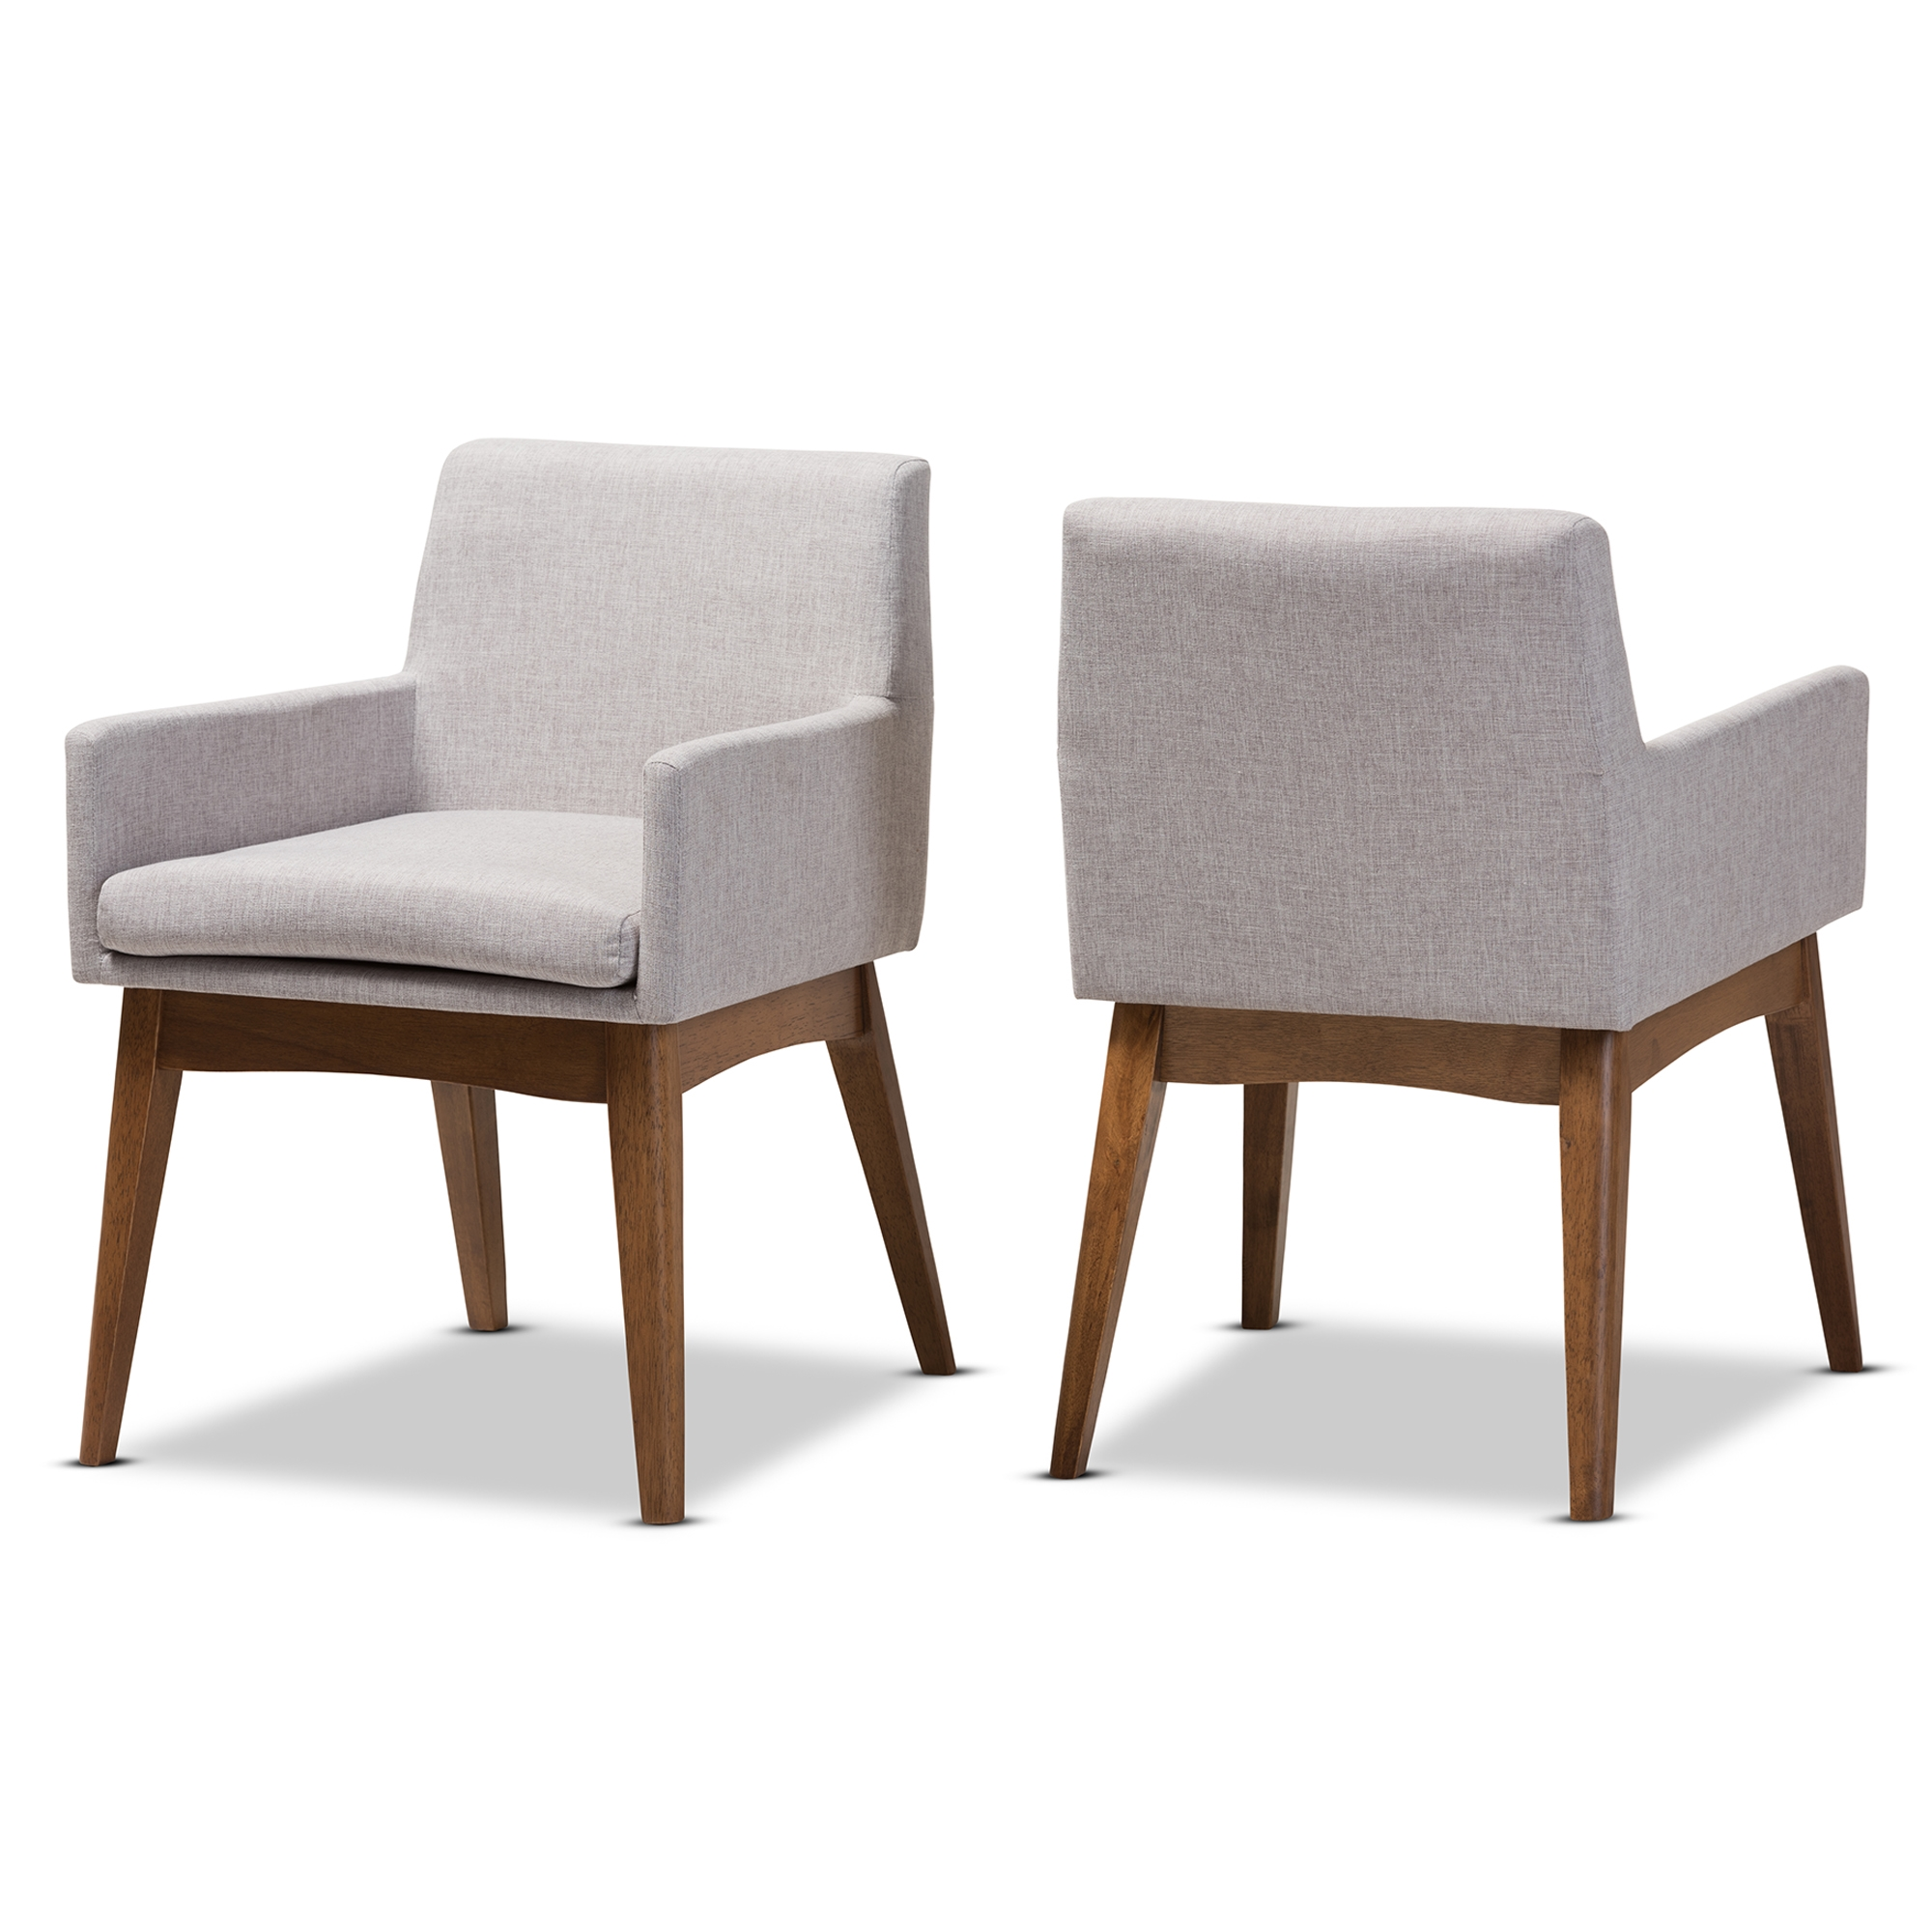 baxton studio nexus midcentury modern walnut wood finishing greyish beige fabric dining armchair affordable